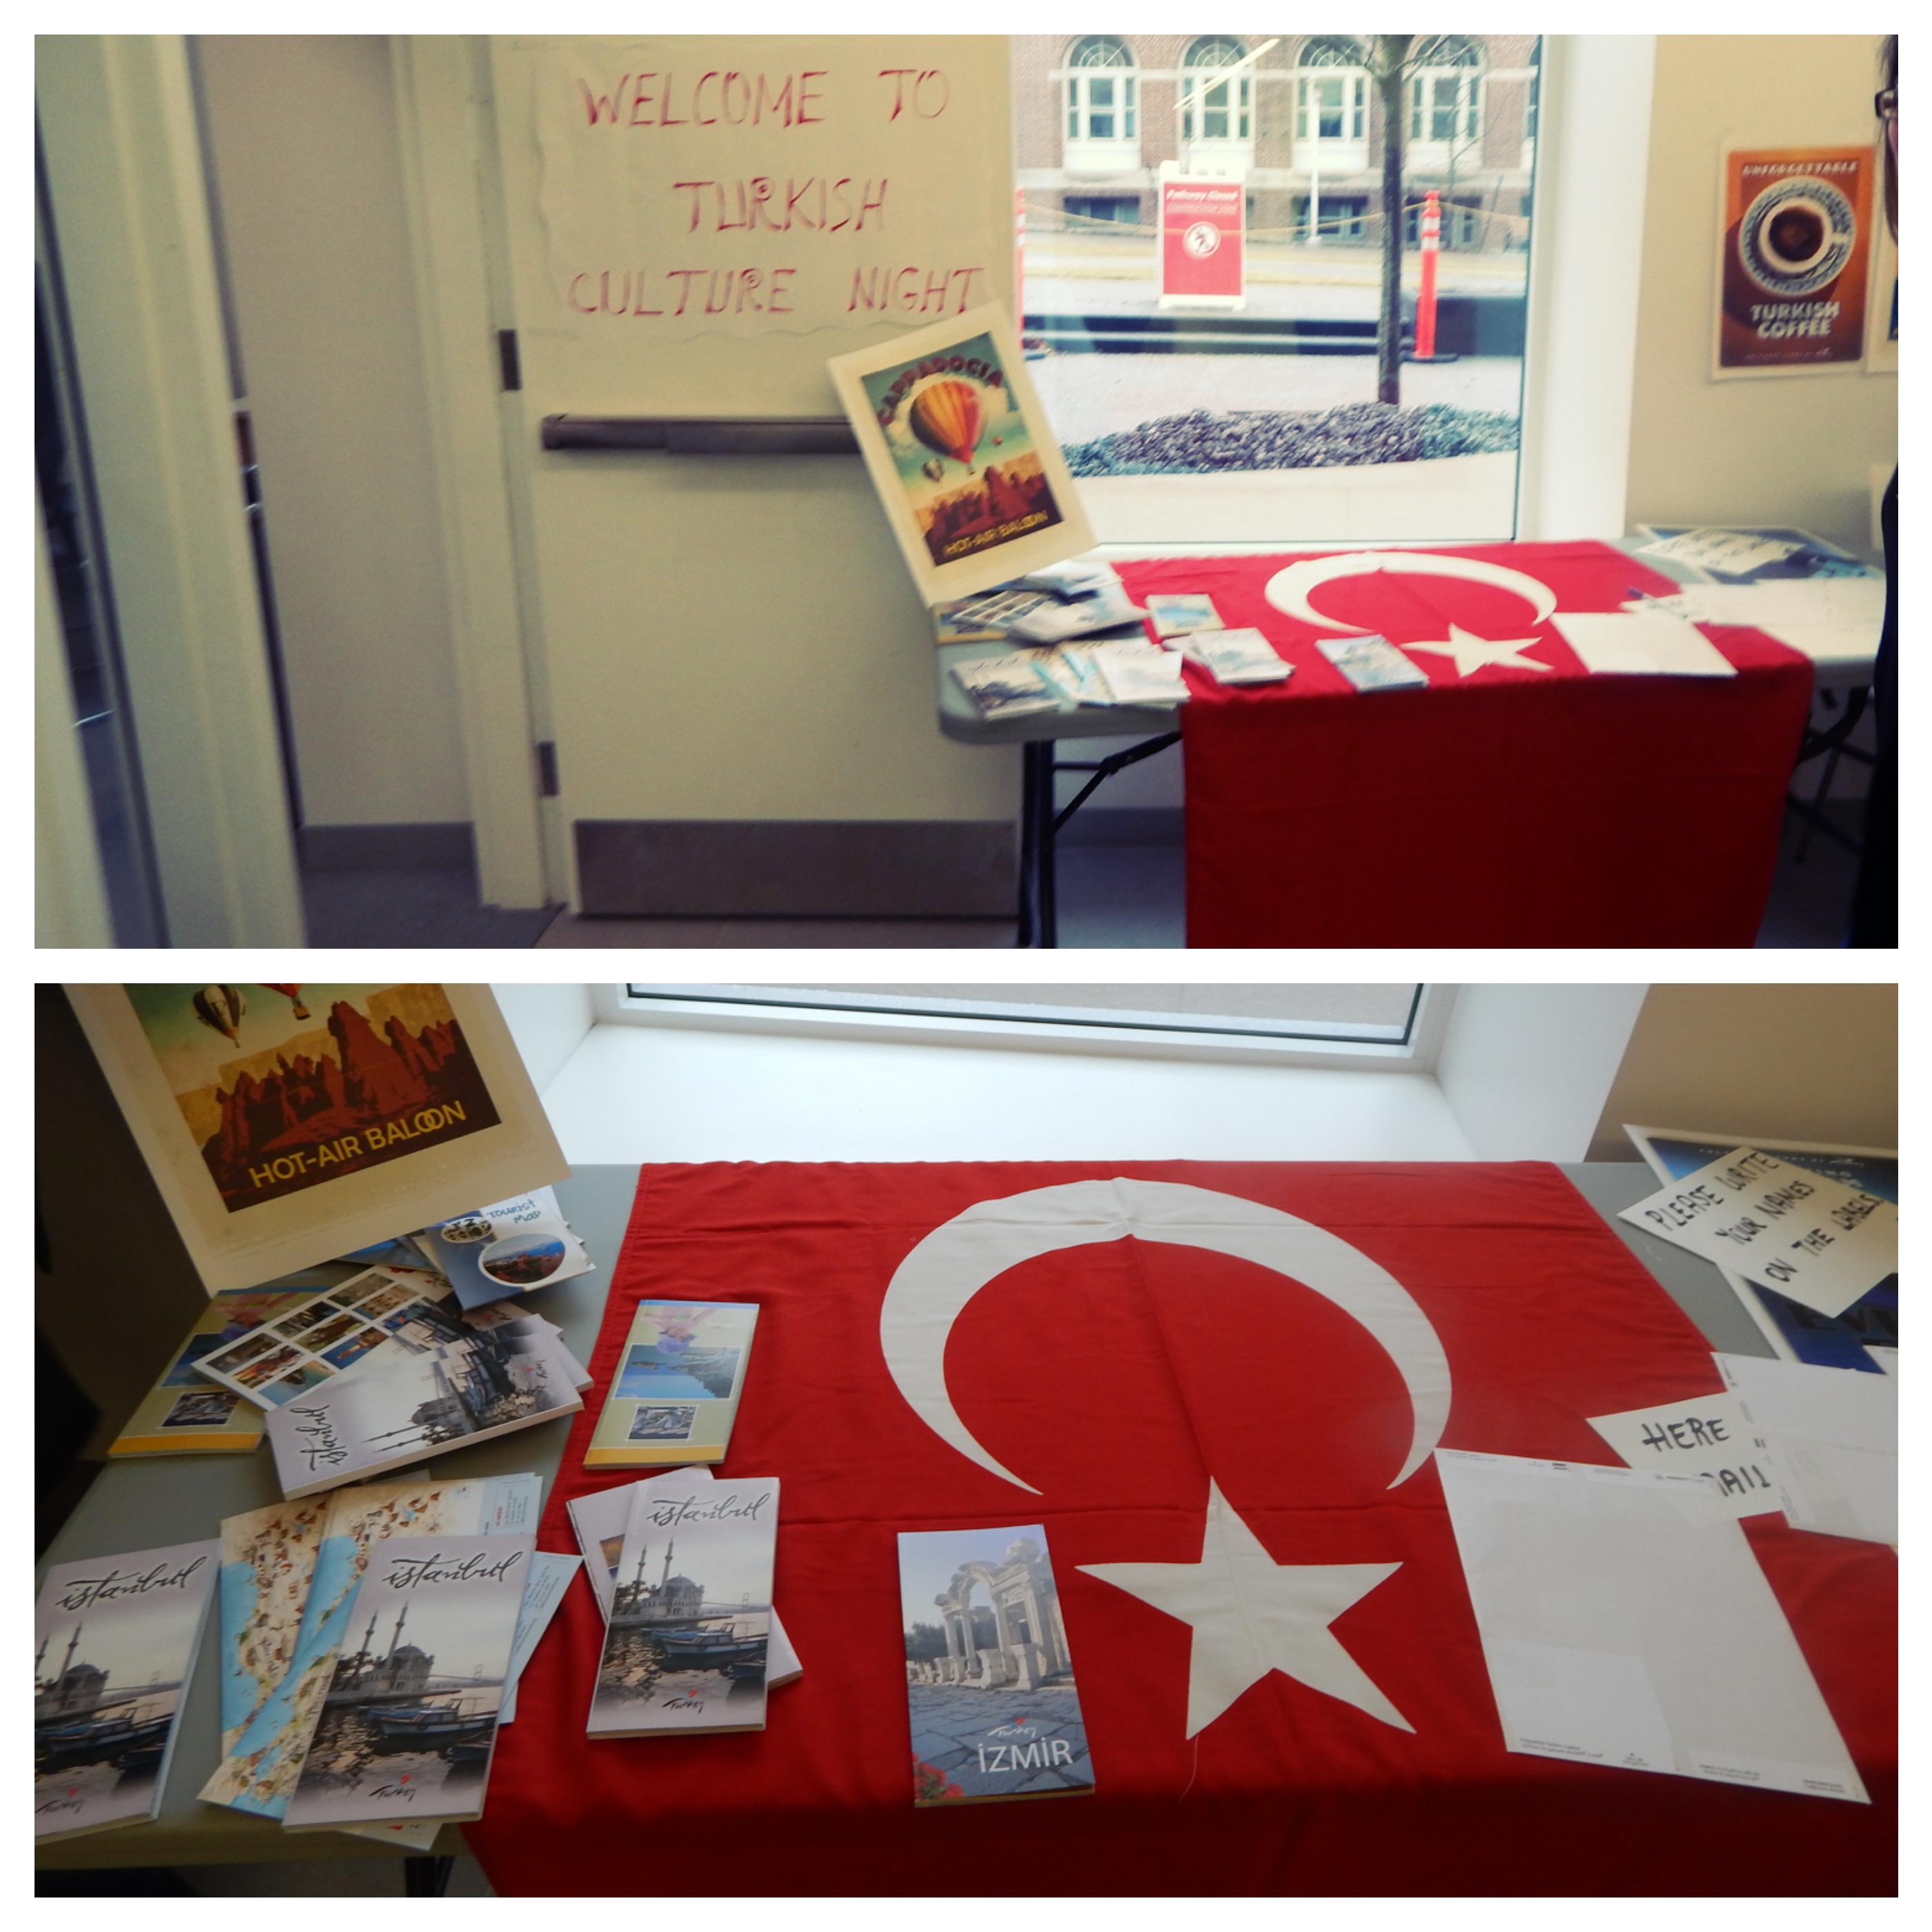 Turkish Culture Night Center for Language Studies